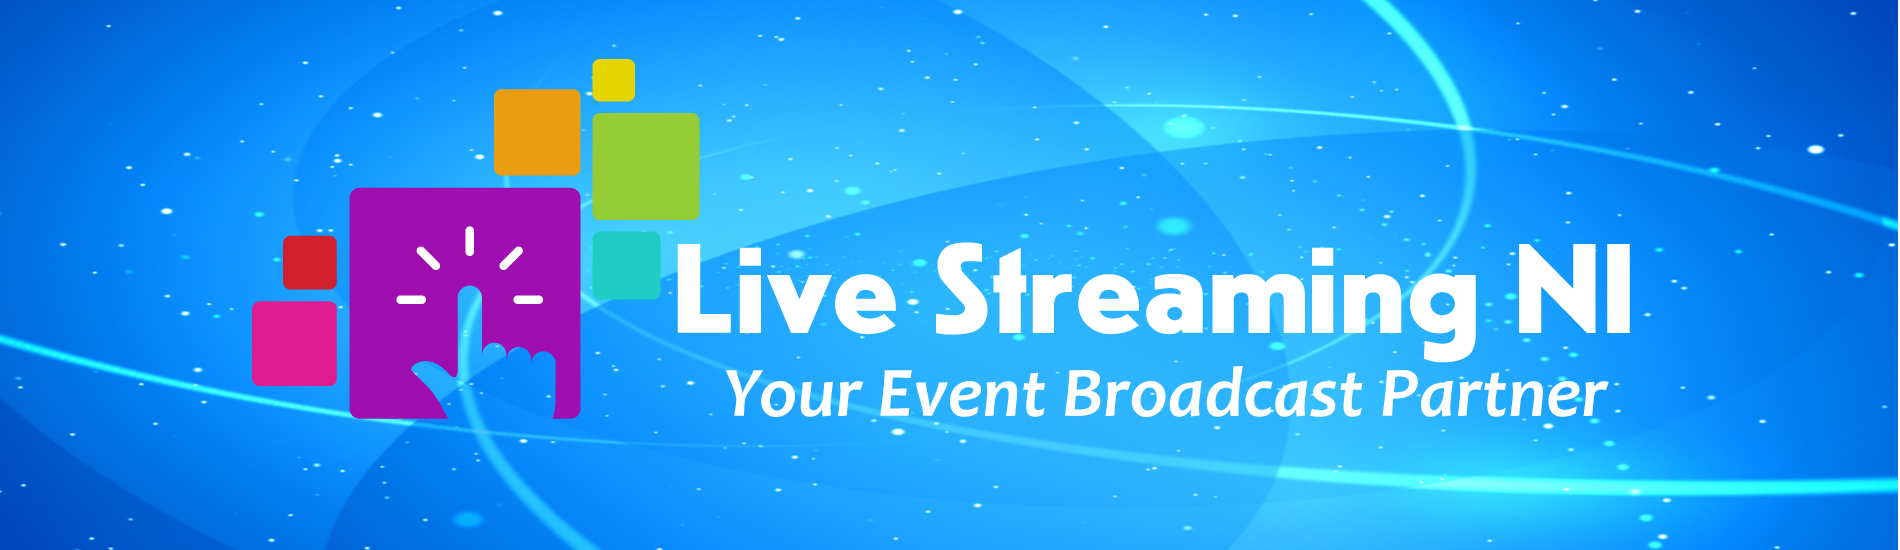 Live Streaming NI